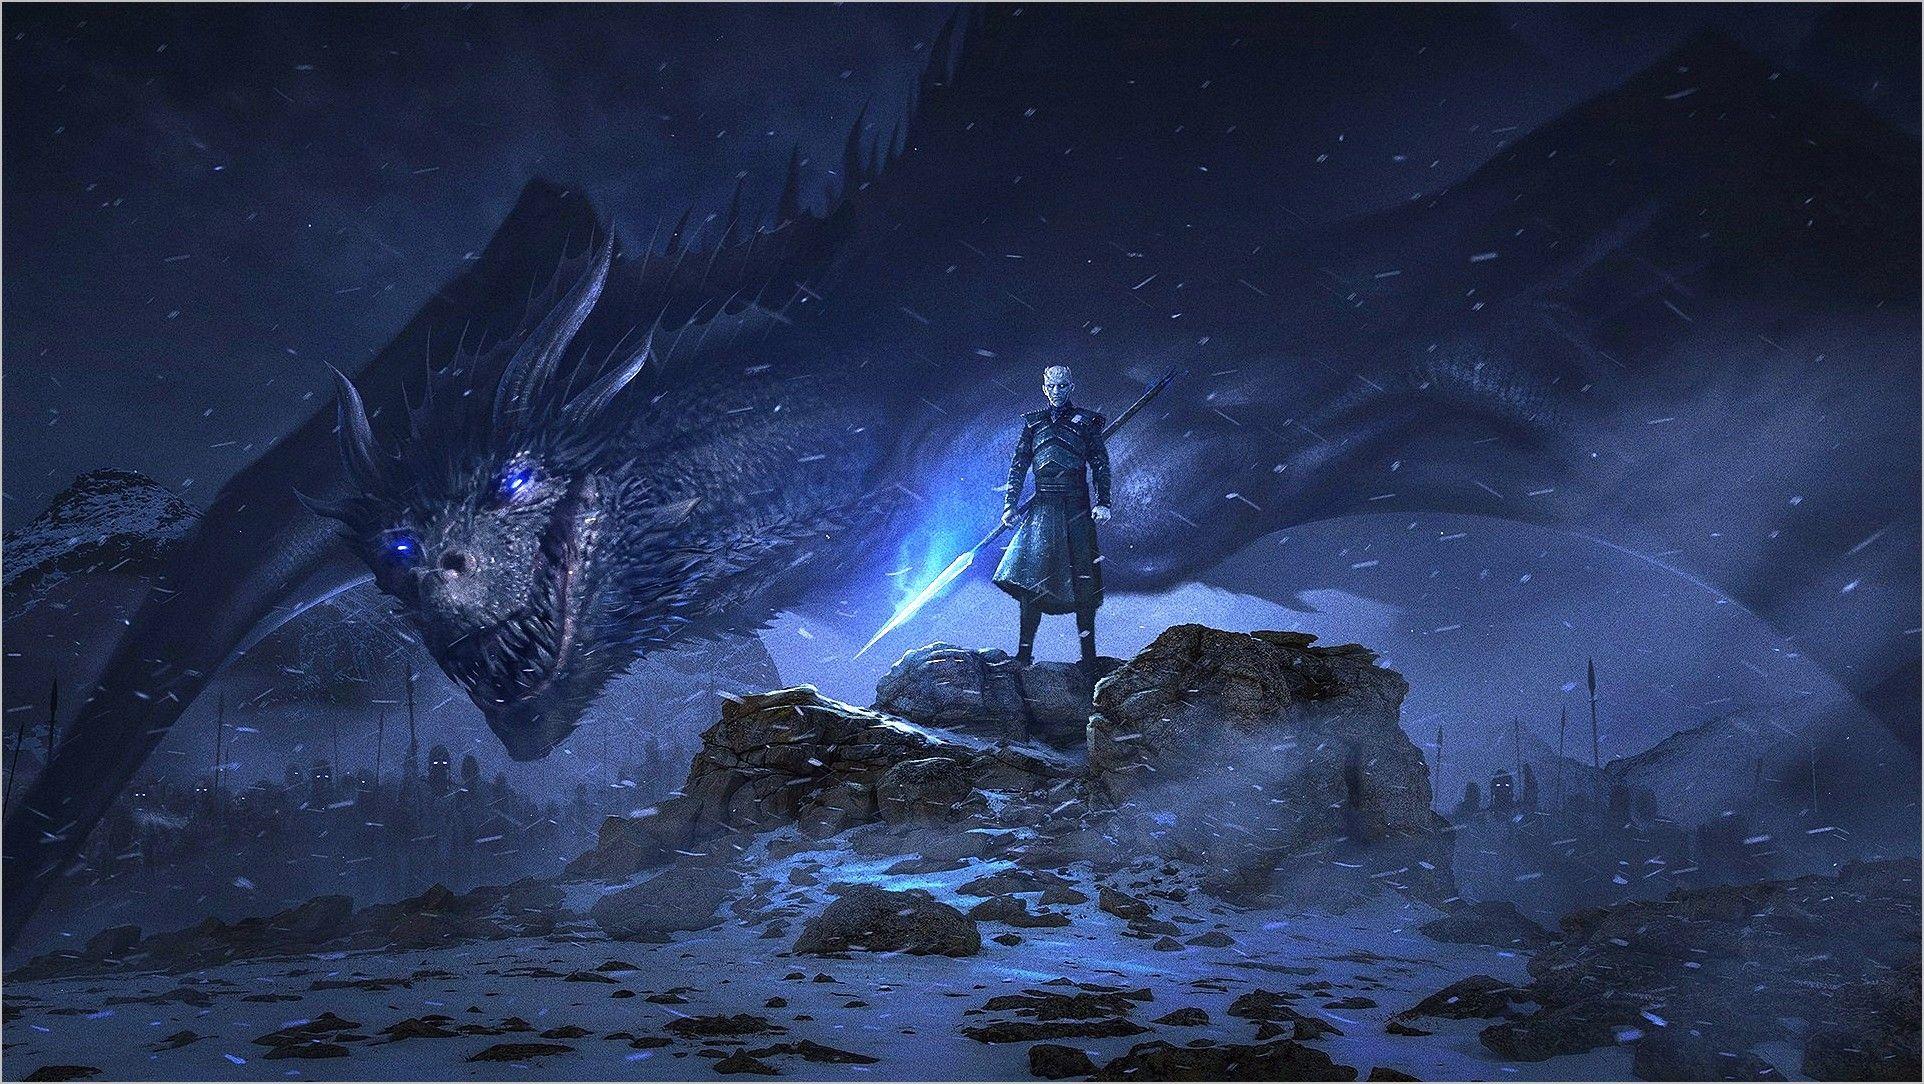 Game Of Thrones Wallpaper 4k Reddit Game Of Thrones Artwork Game Of Thrones Dragons Game Of Thrones Art